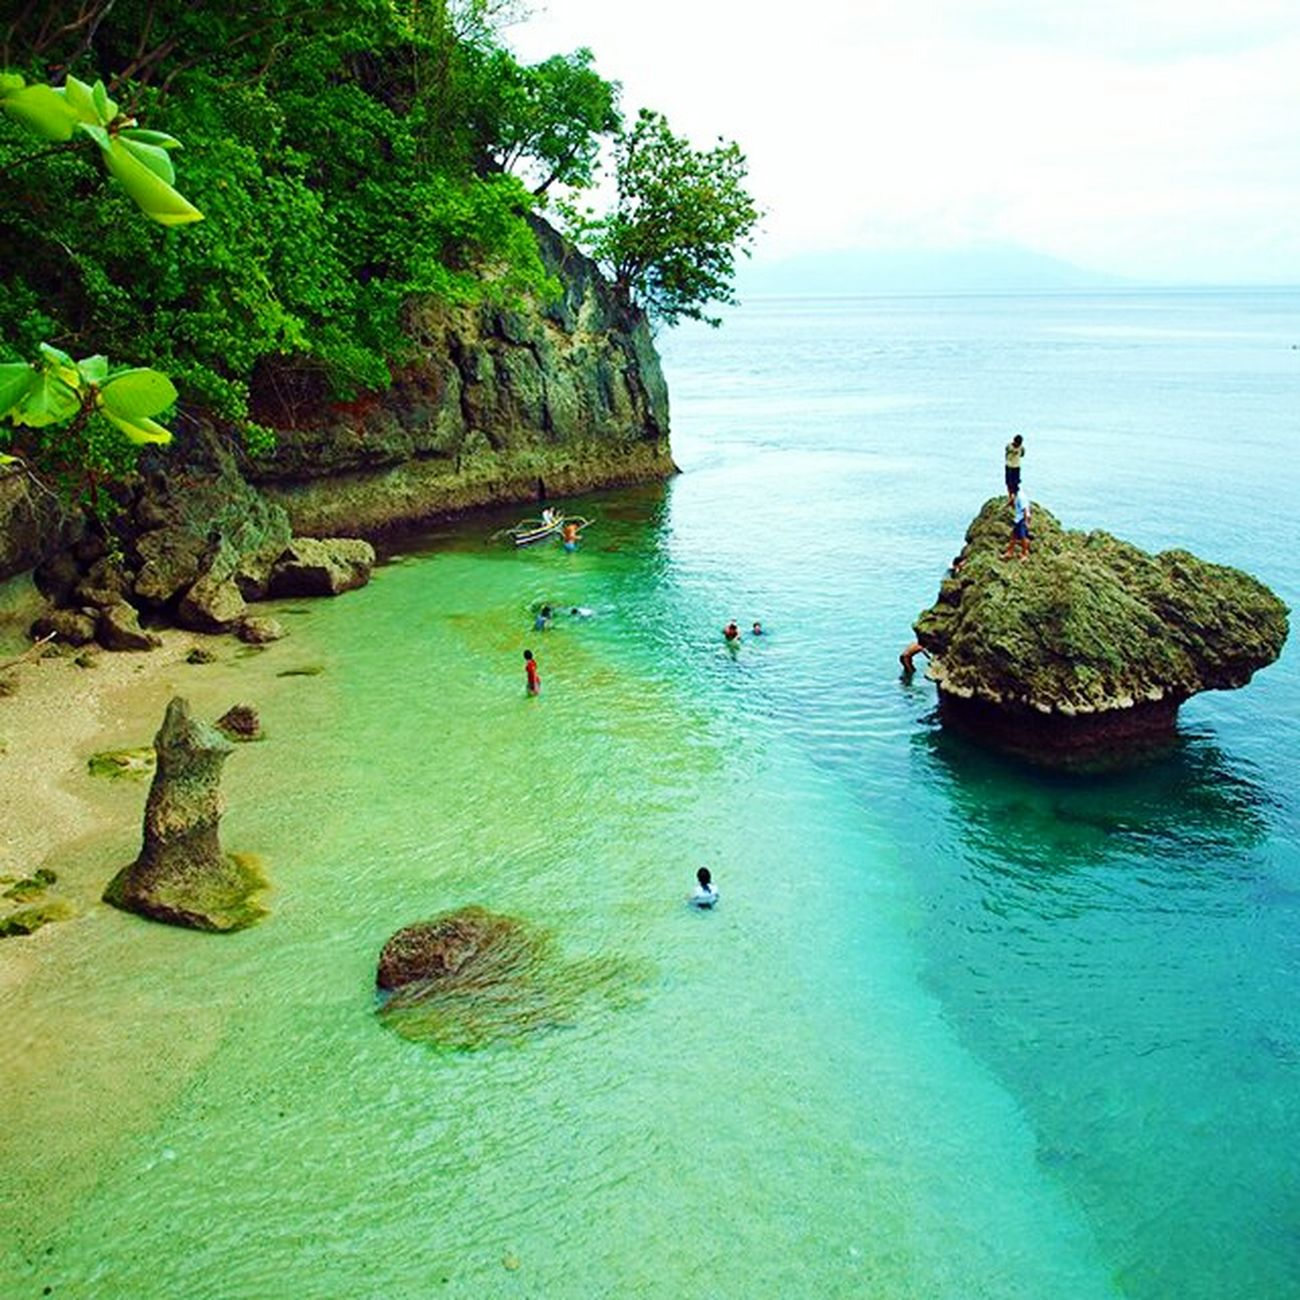 Itsmorefuninthephilippines Canibad Paradise! paradigm Beachin' Loveit♥ Whitesand Rockformation Rockformations Divingspot 👌👌👍👍